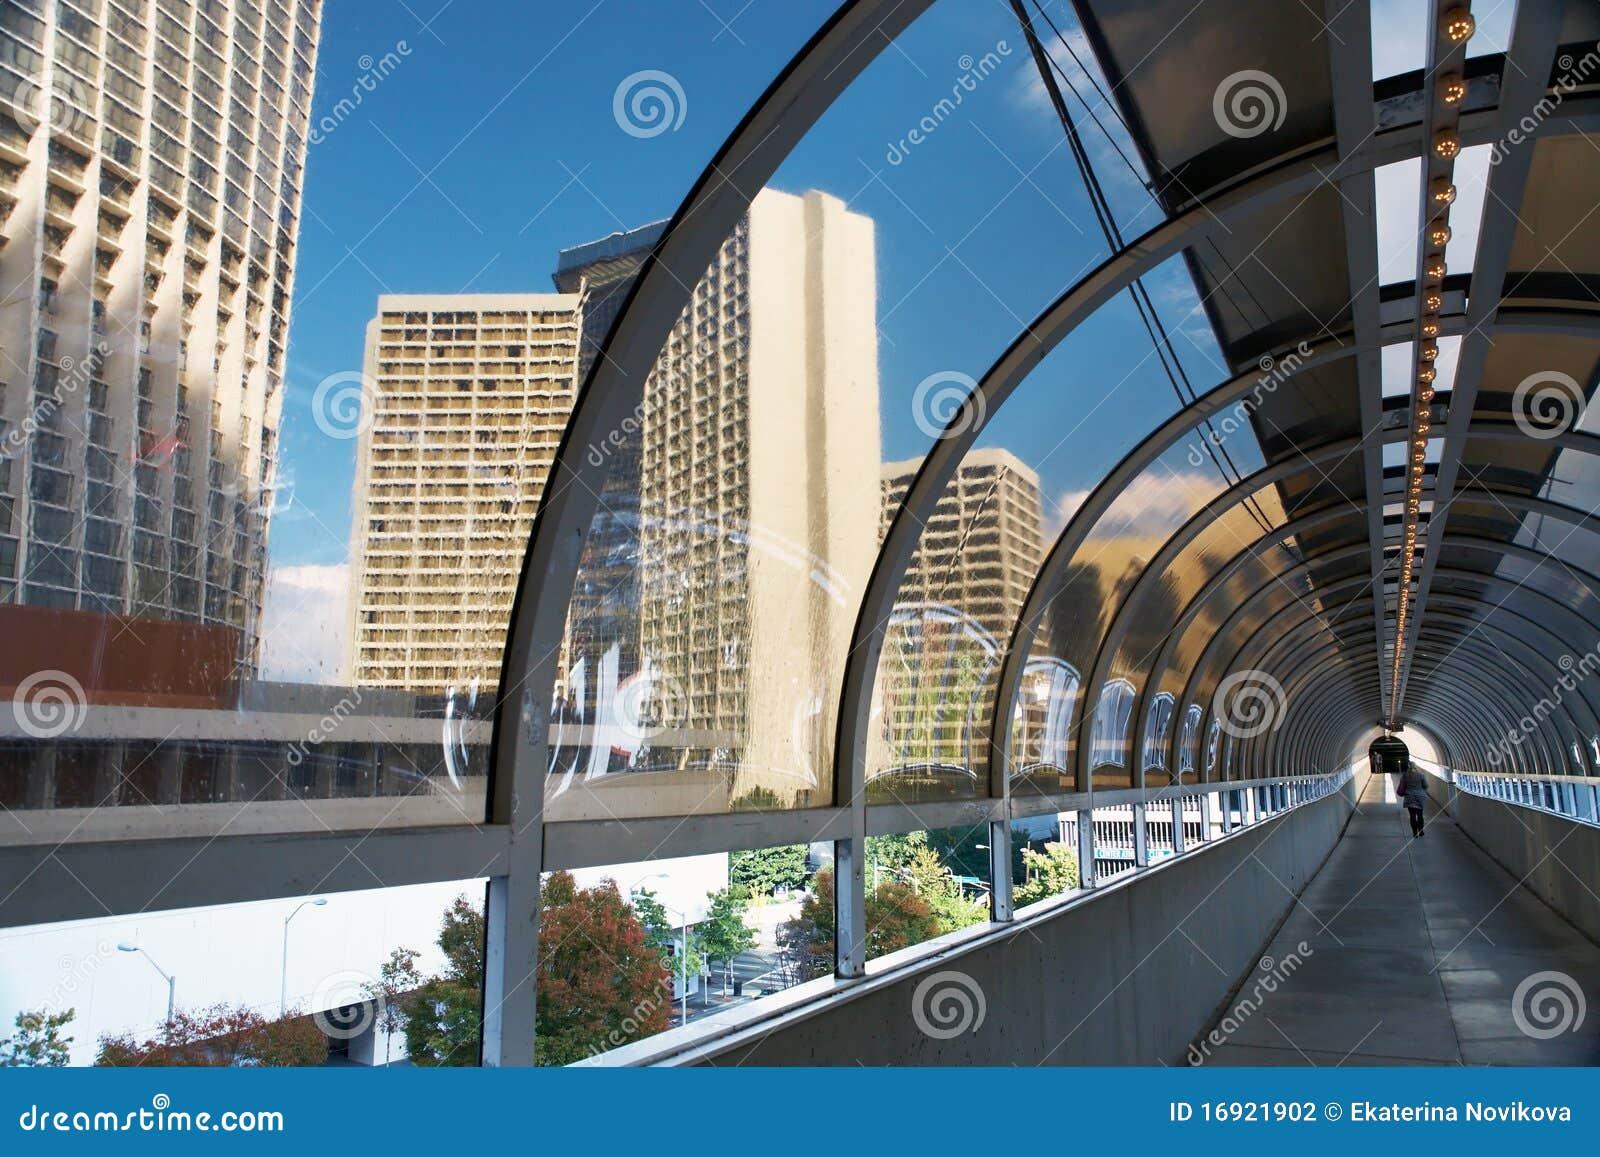 Túnel entre dois edifícios. Atlanta.